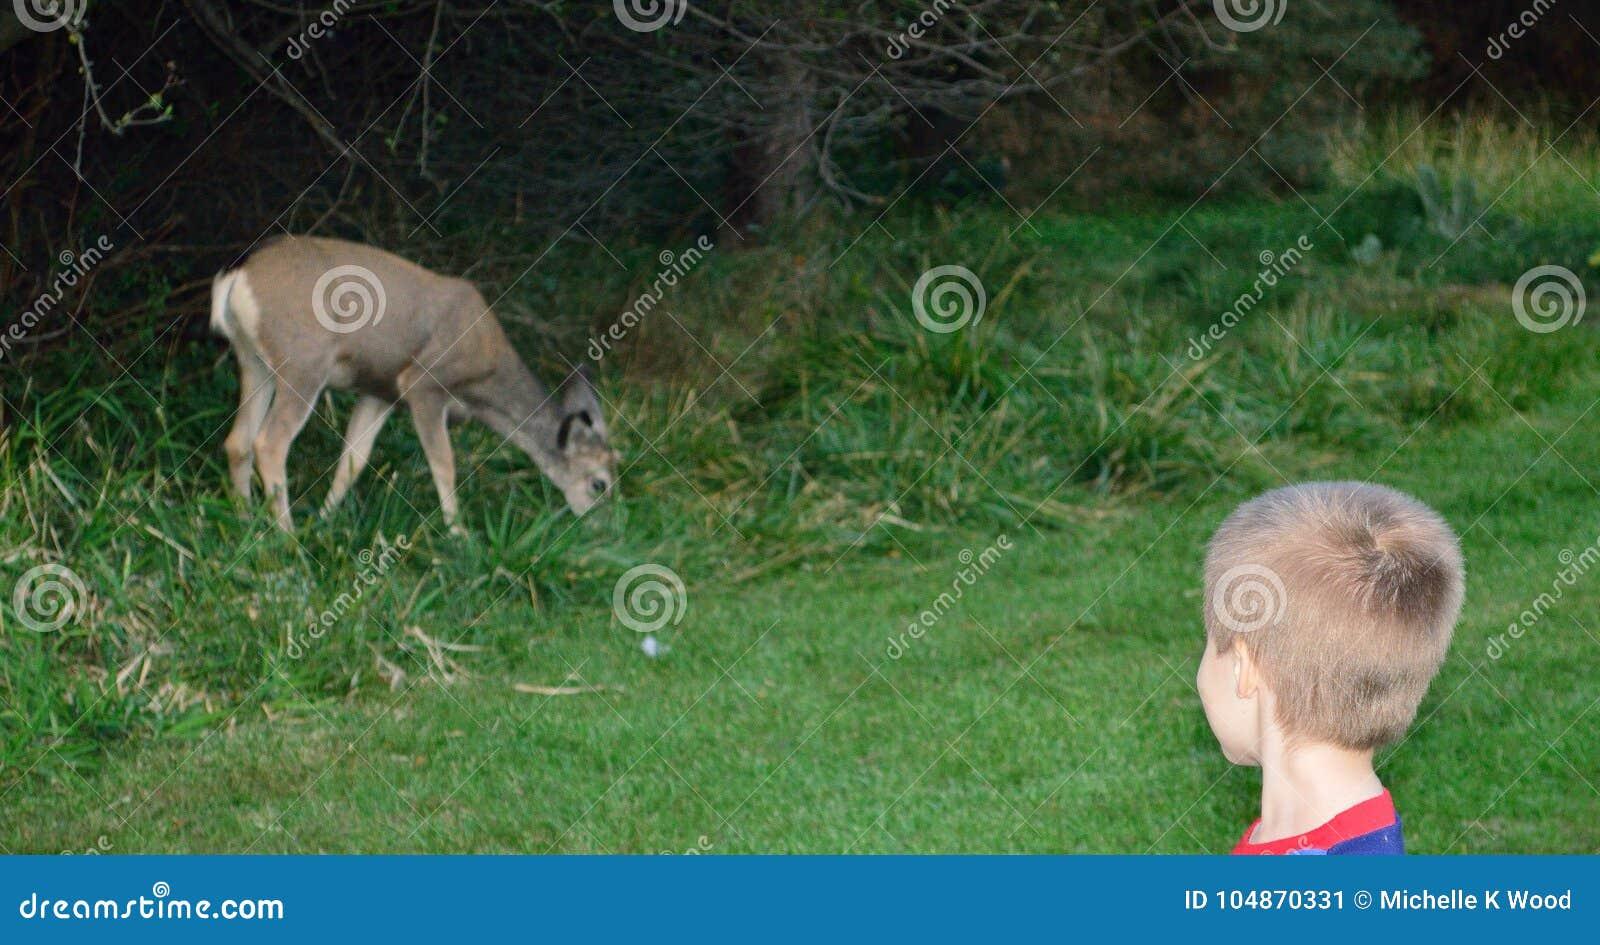 Five-year-old Boy meets deer